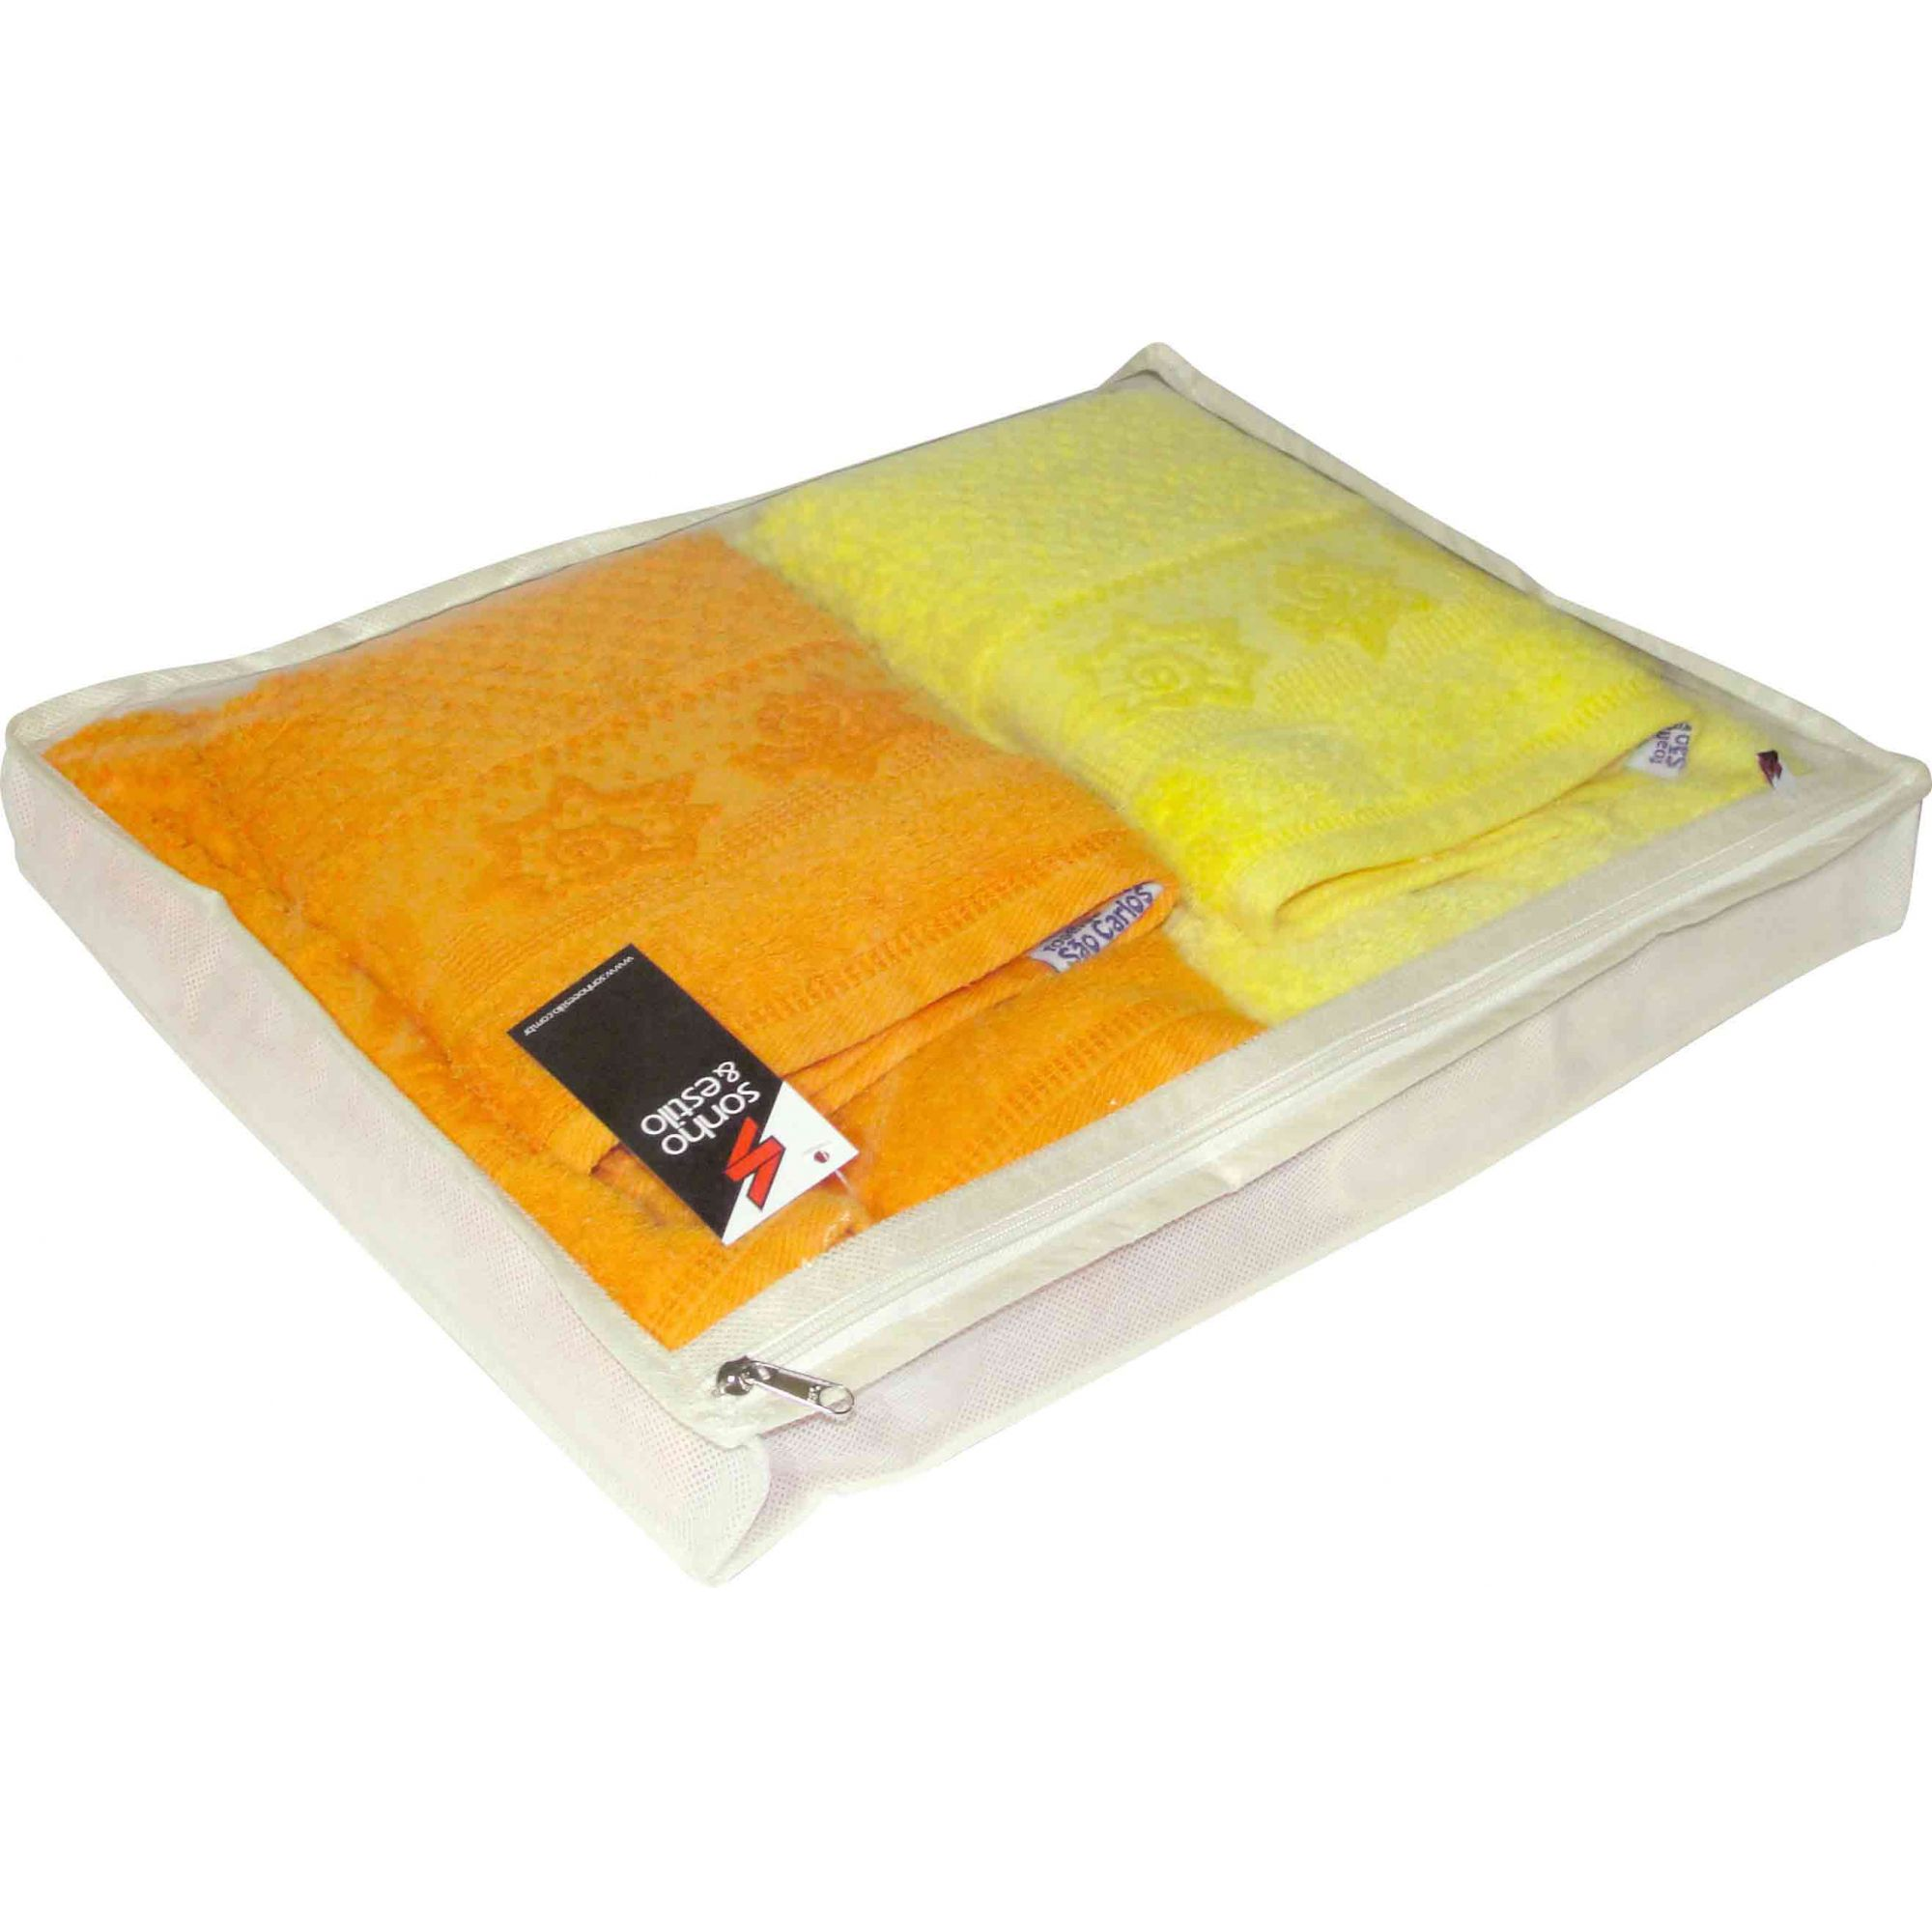 Protetor p/ Lençol/Toalha Tam. 2 48x37x6cm Branco